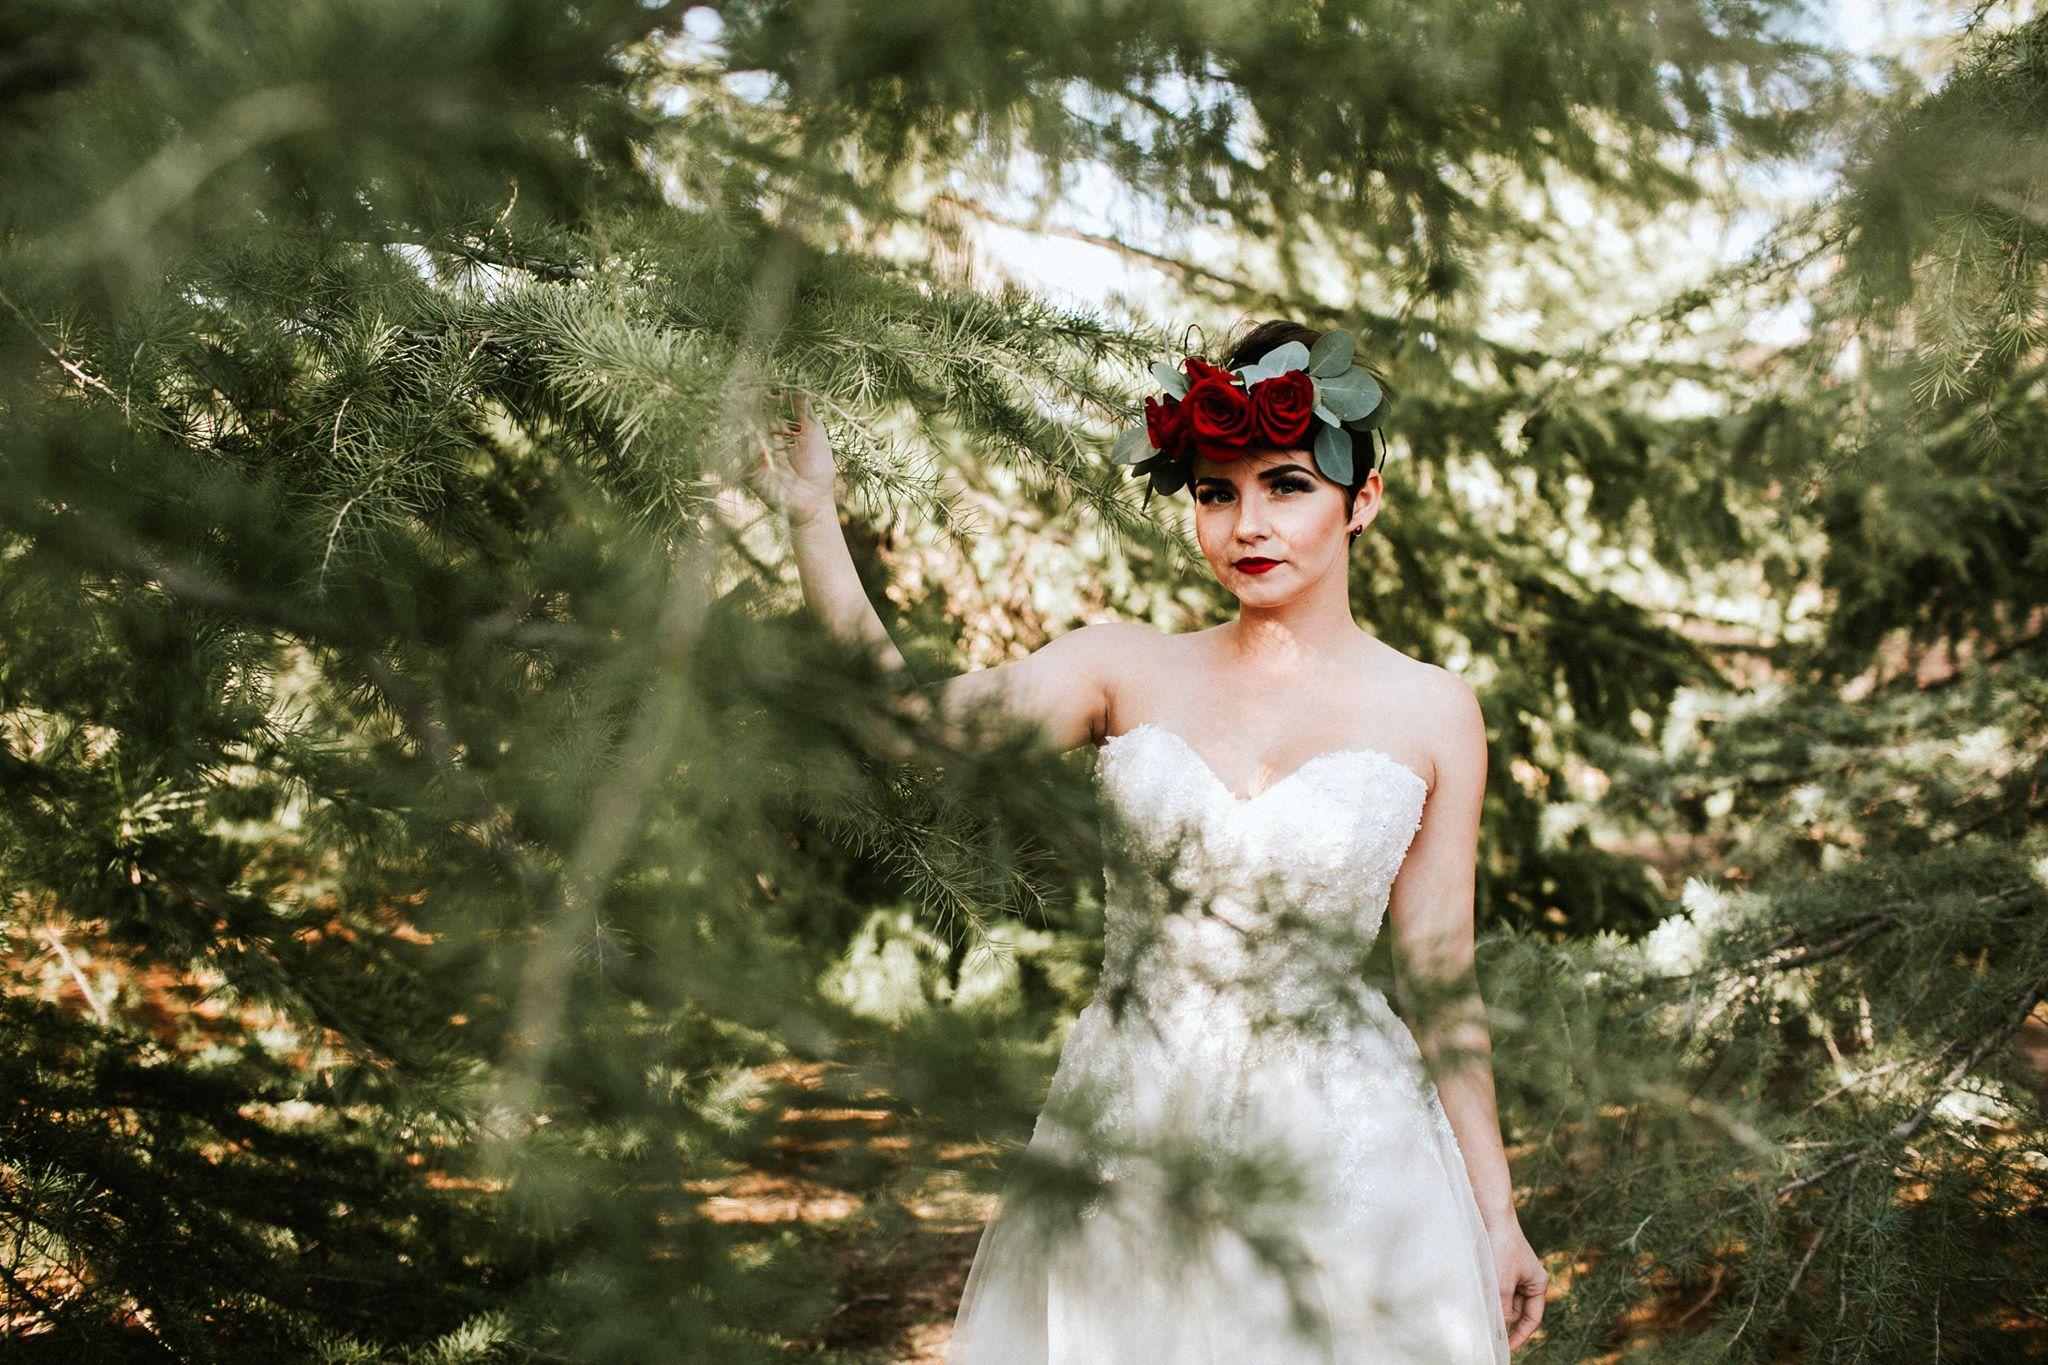 laura_shane_snow_SMitten_bridal_hesperia.jpg